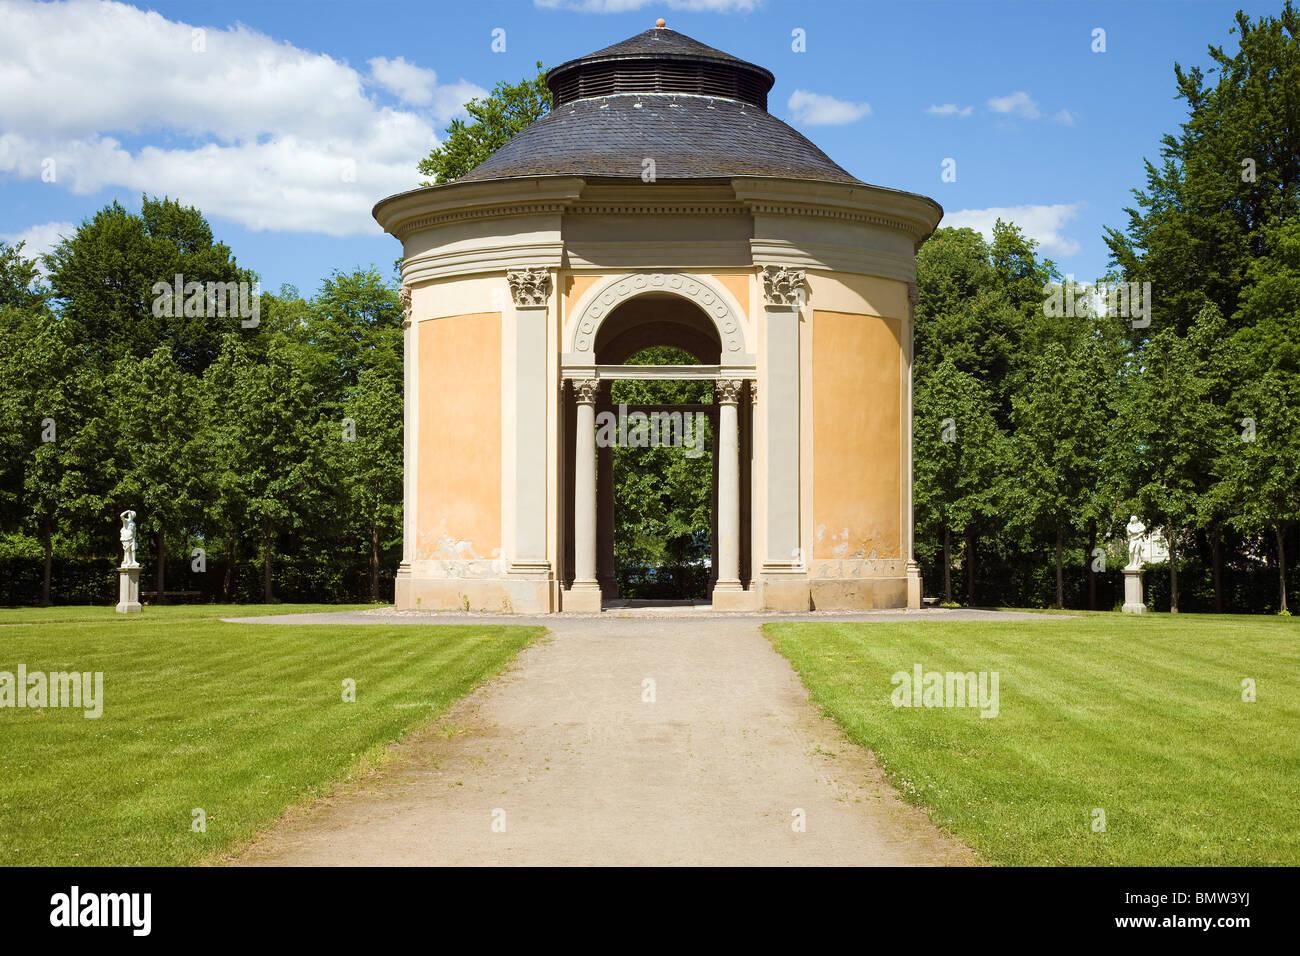 Schloss Rheinsberg, Brandenburg, Germany - Salon - Stock Image